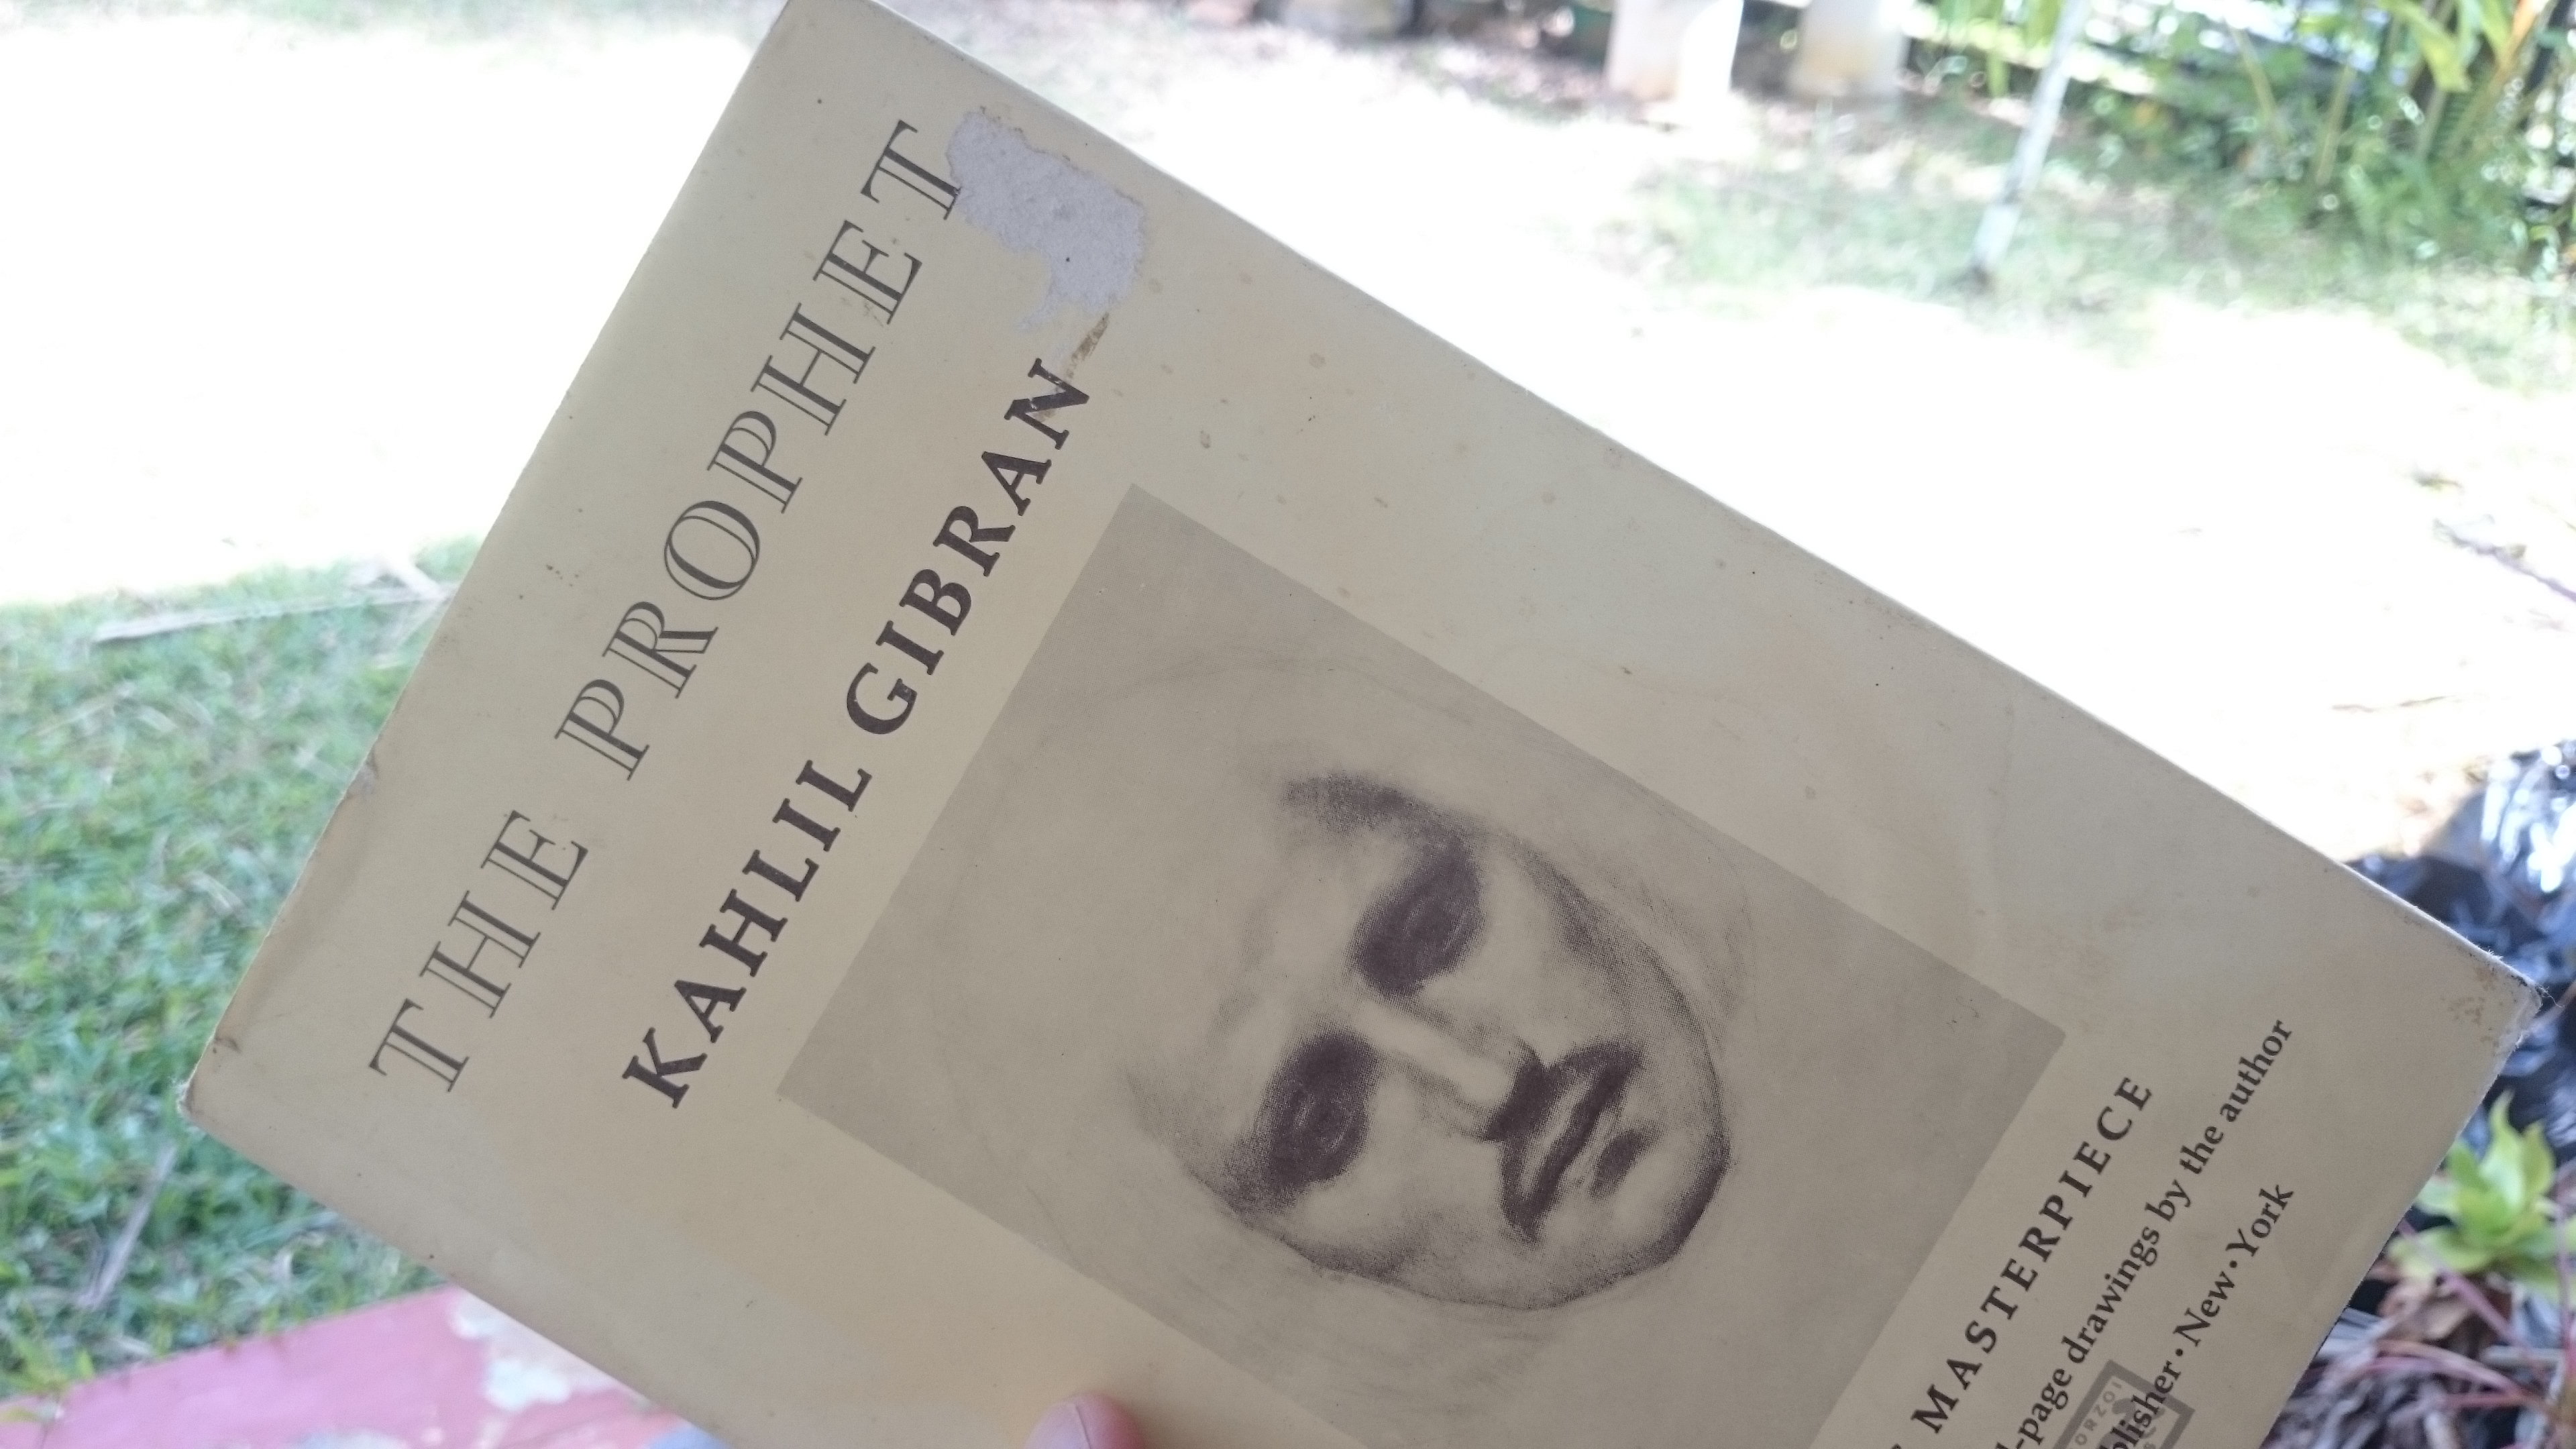 The Prophet, Khalil Gibran